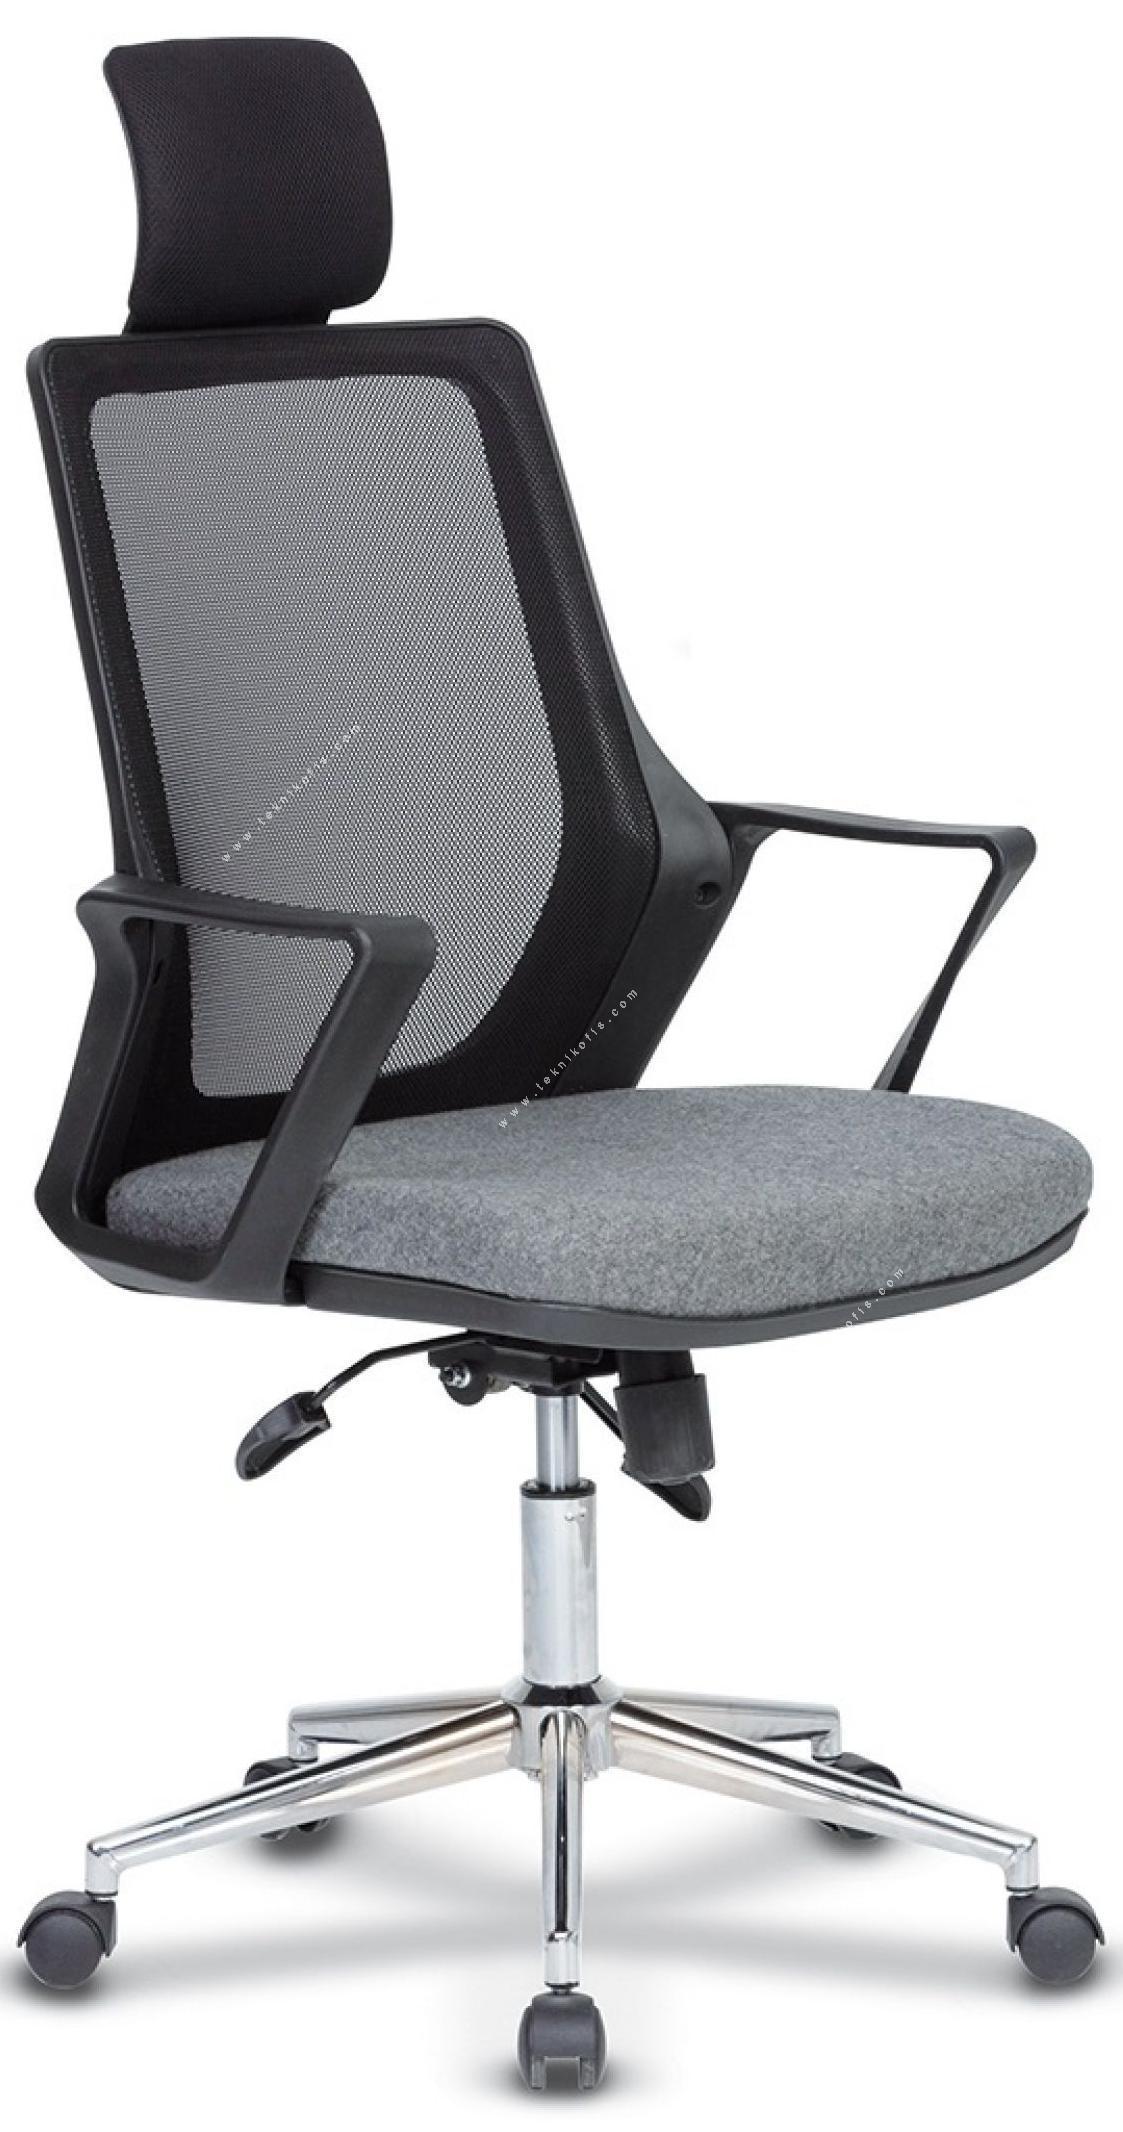 almania fileli yönetici koltuğu